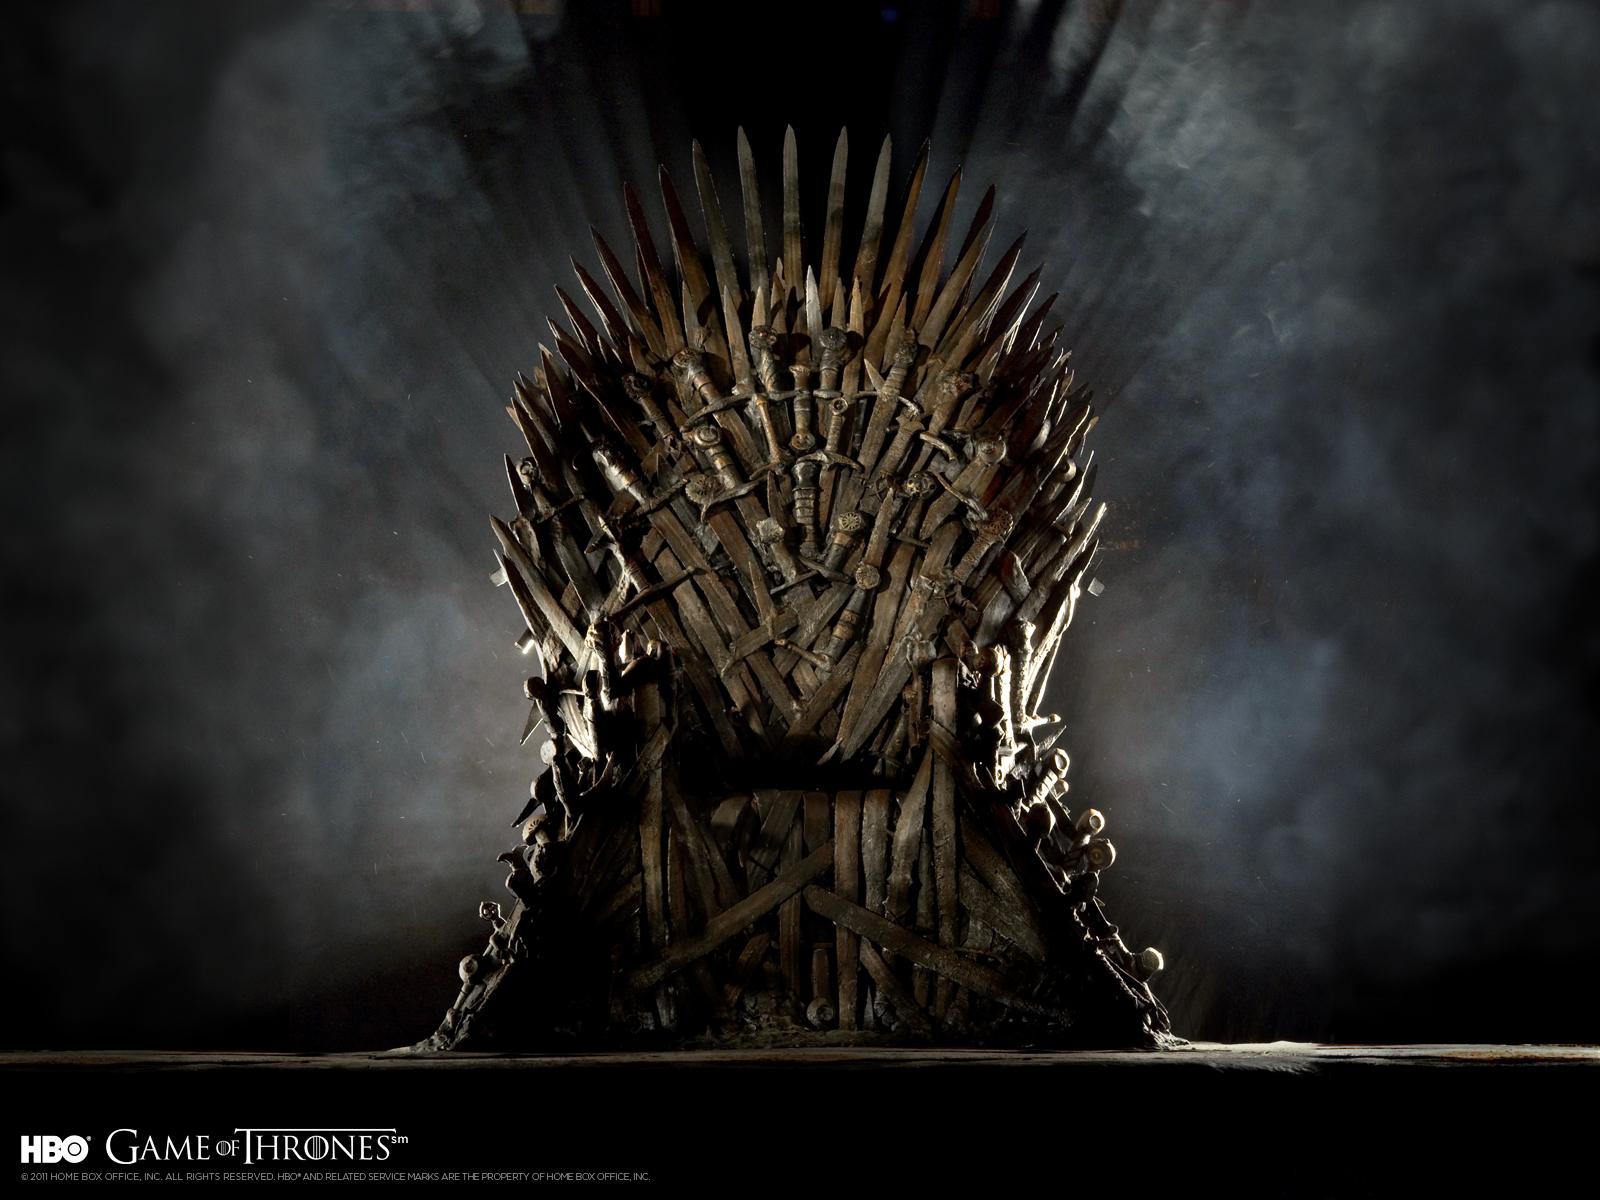 http://3.bp.blogspot.com/-tC4WVkhStoI/TcQwl2GRJvI/AAAAAAAAAVE/skj7hKgwXNM/s1600/wallpaper-iron-throne-1600.jpg